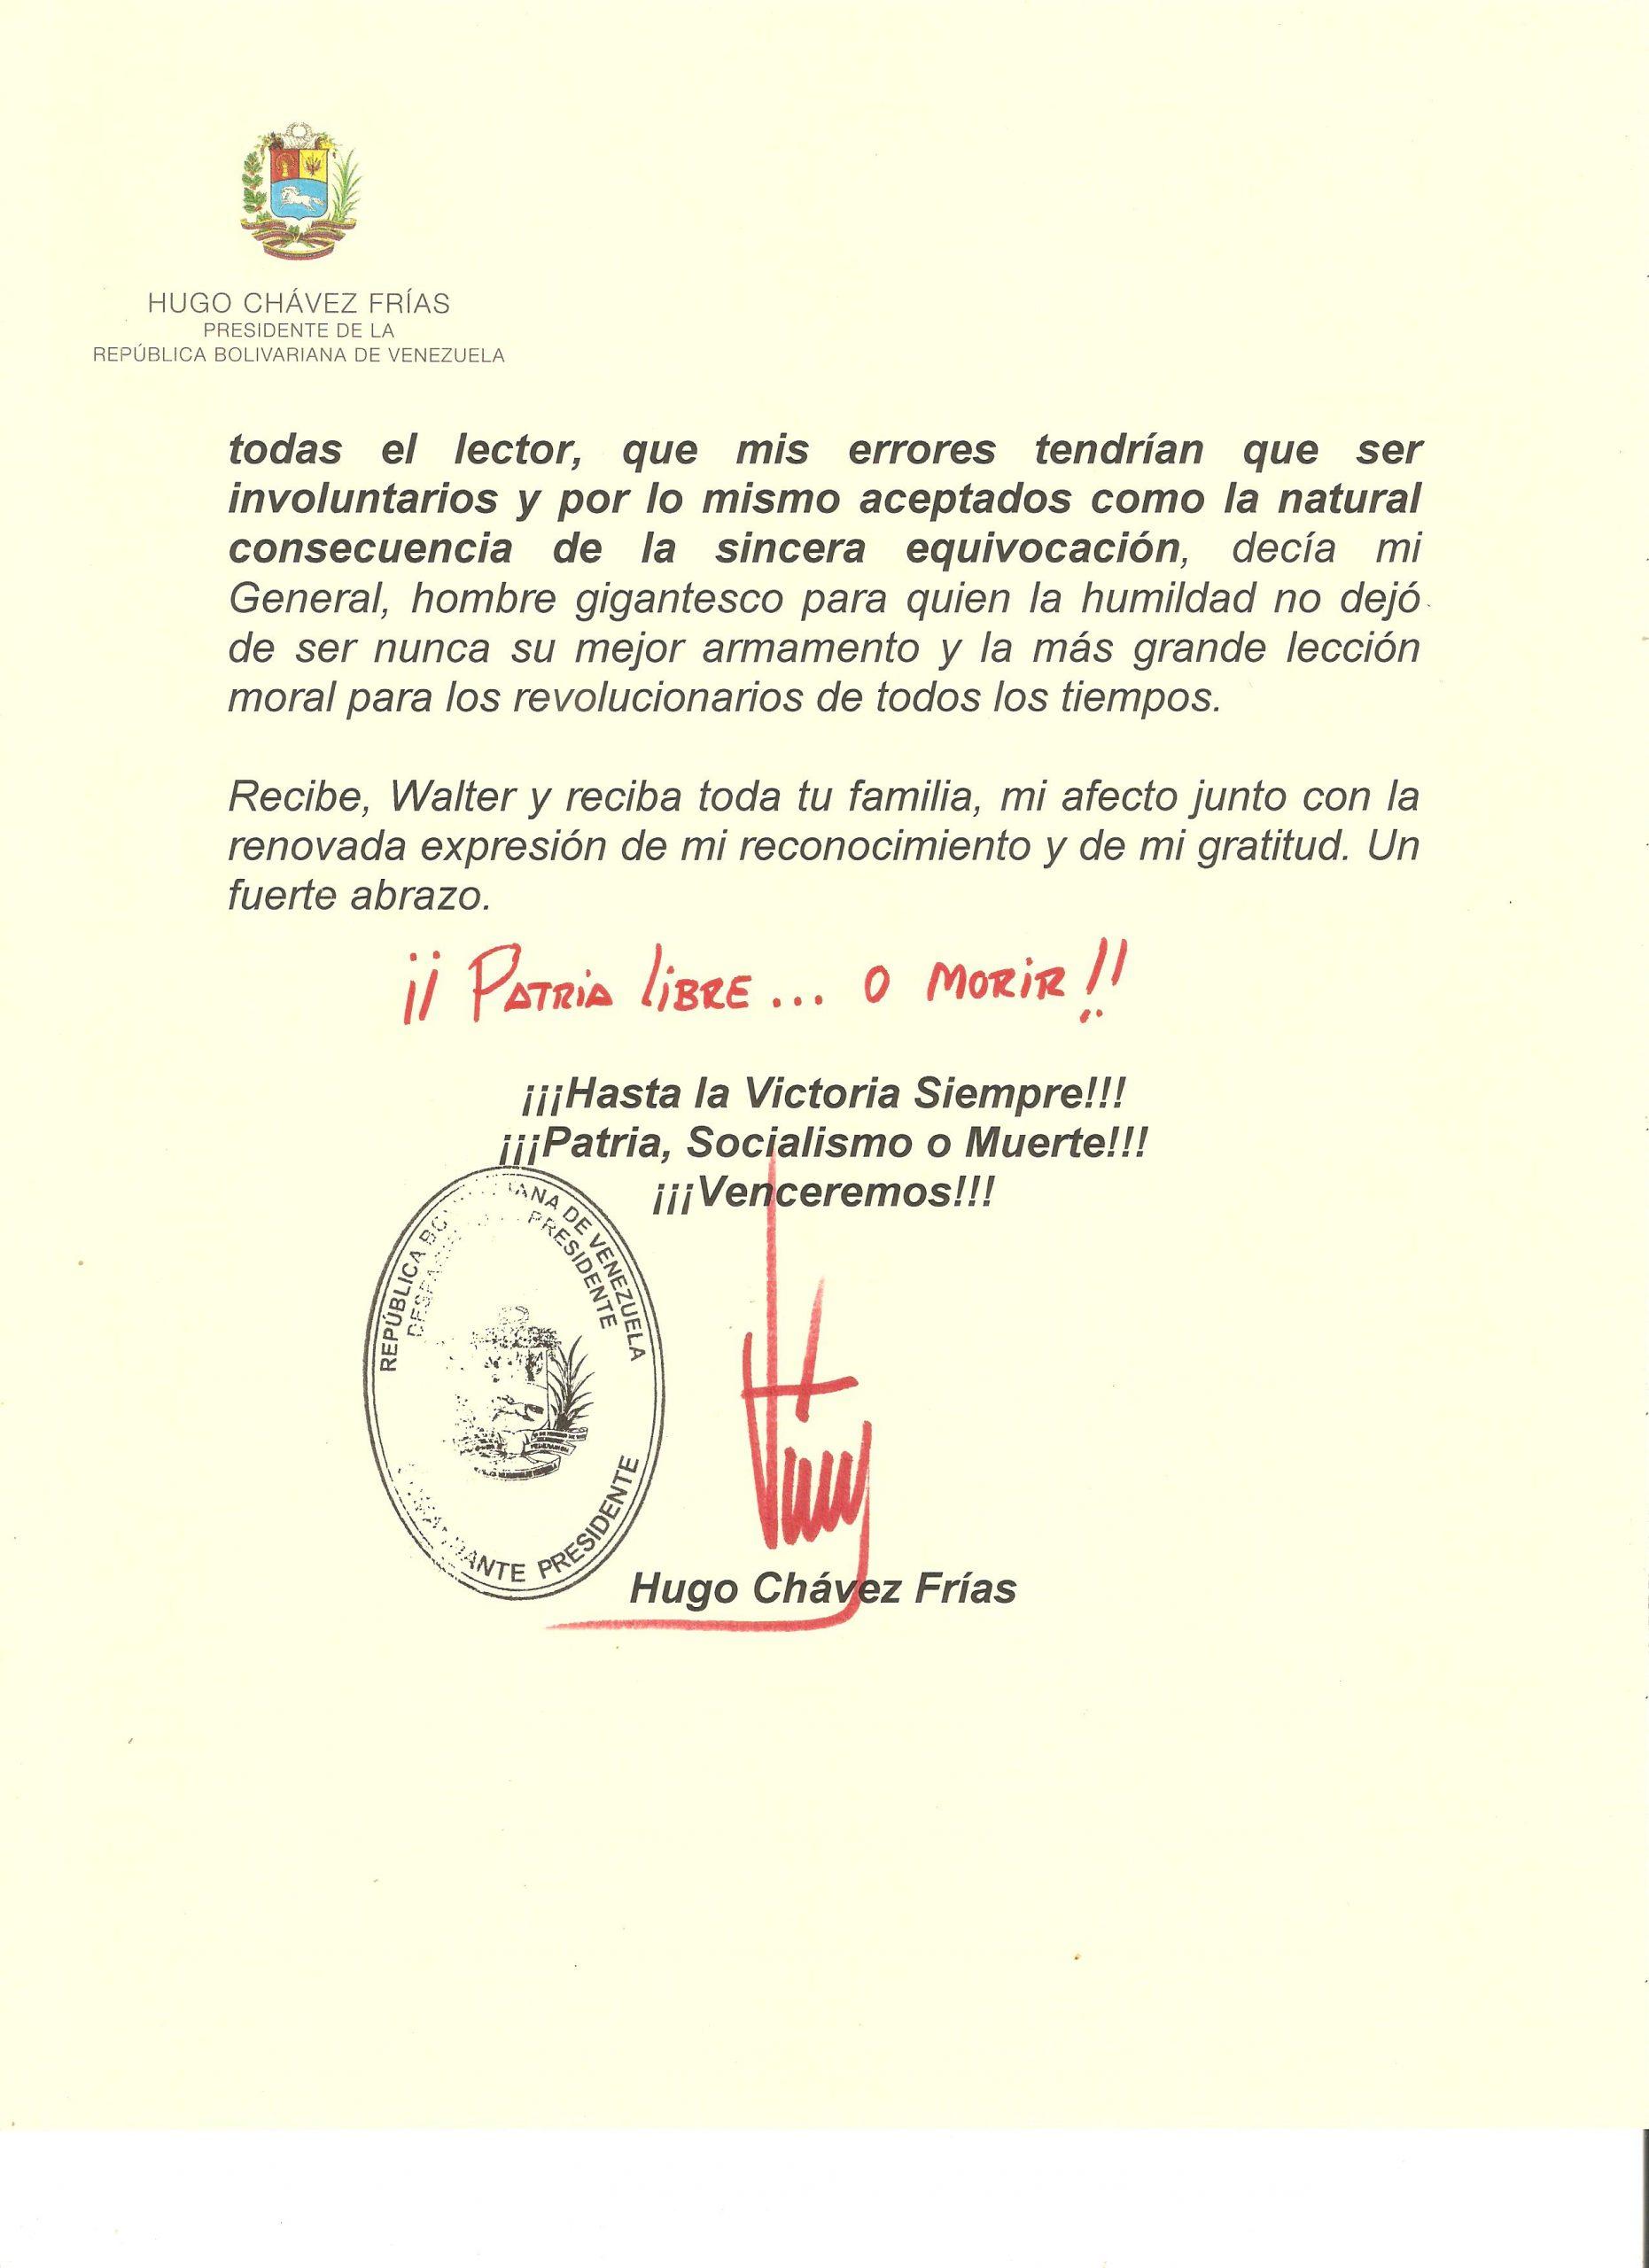 CARTA DE CHAVEZ A WALTER 3